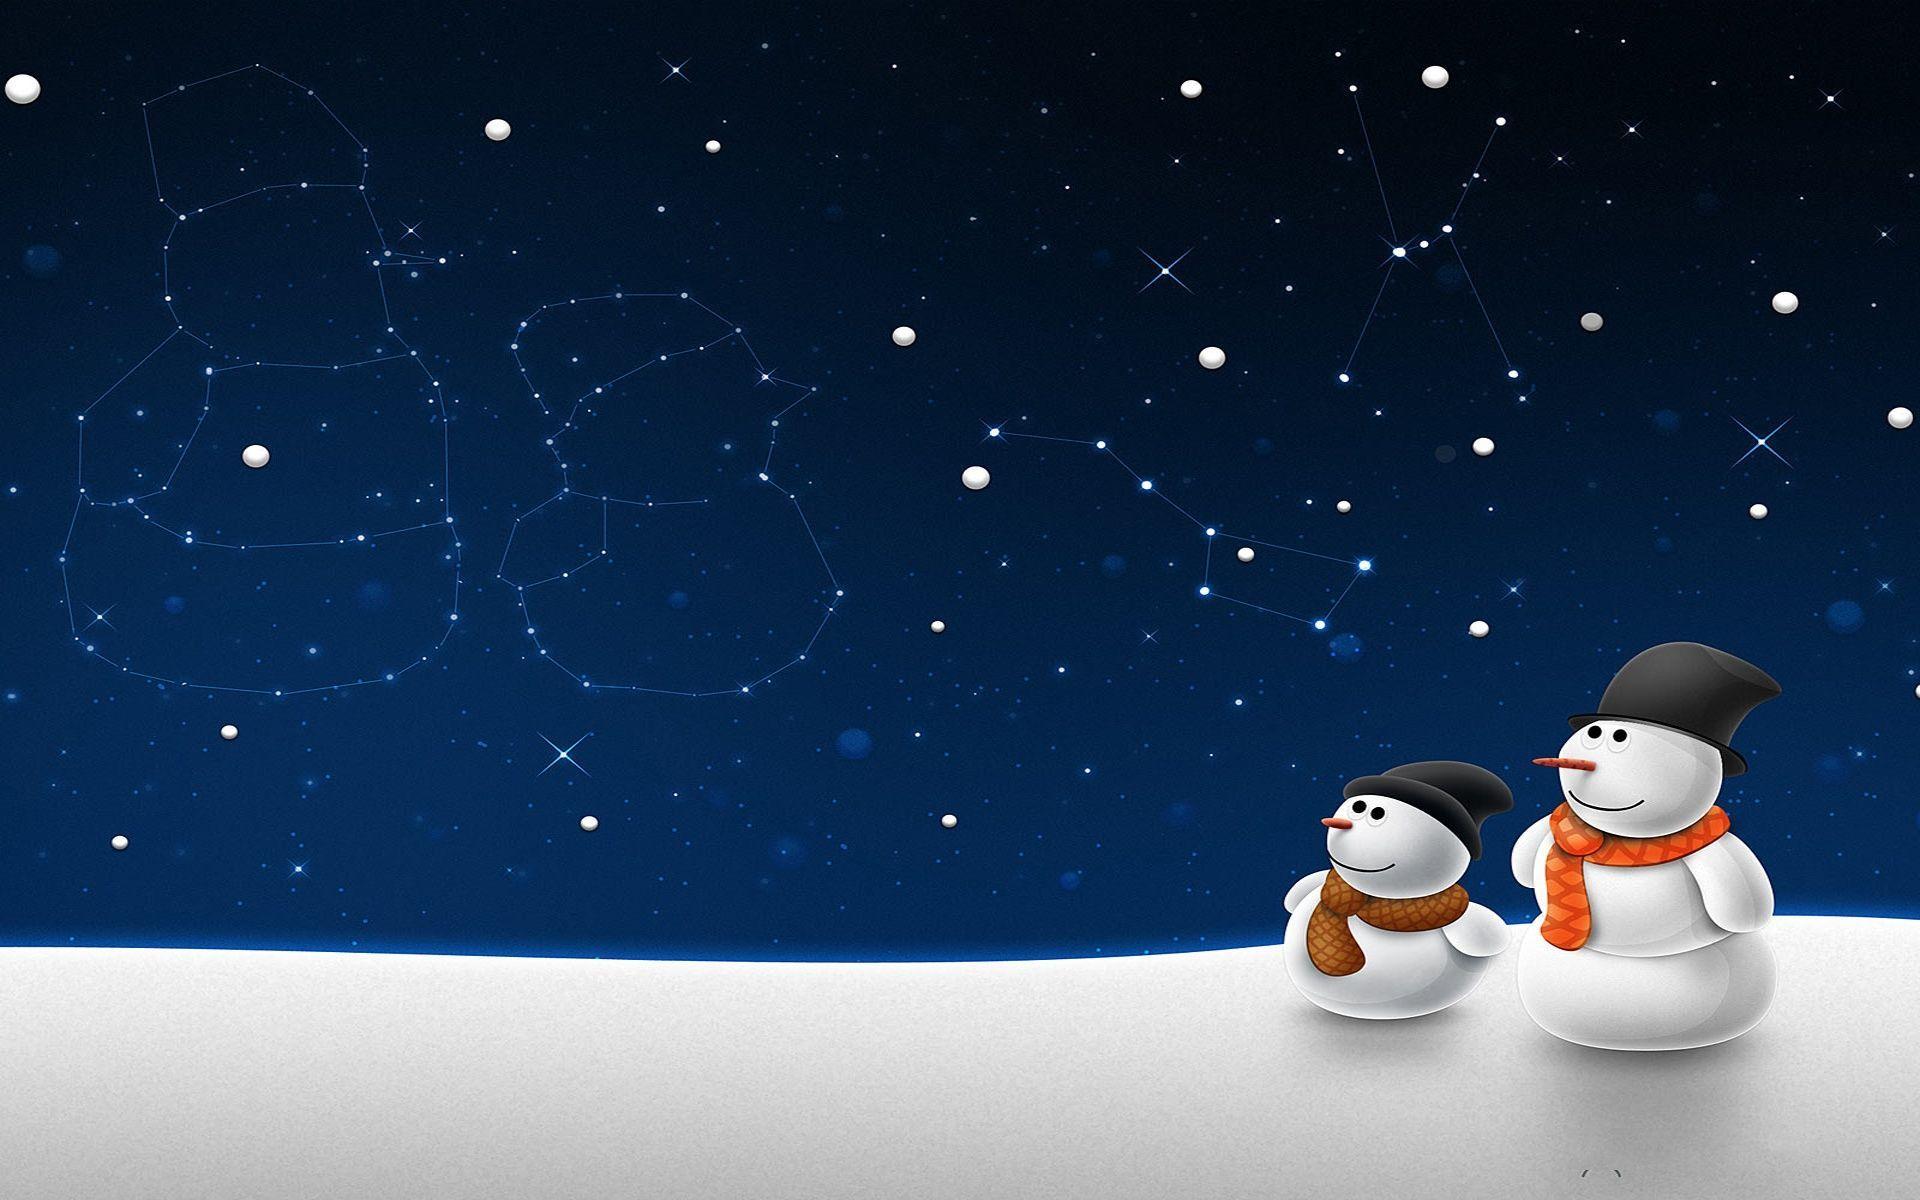 Christmas Snowman Wallpaper HD